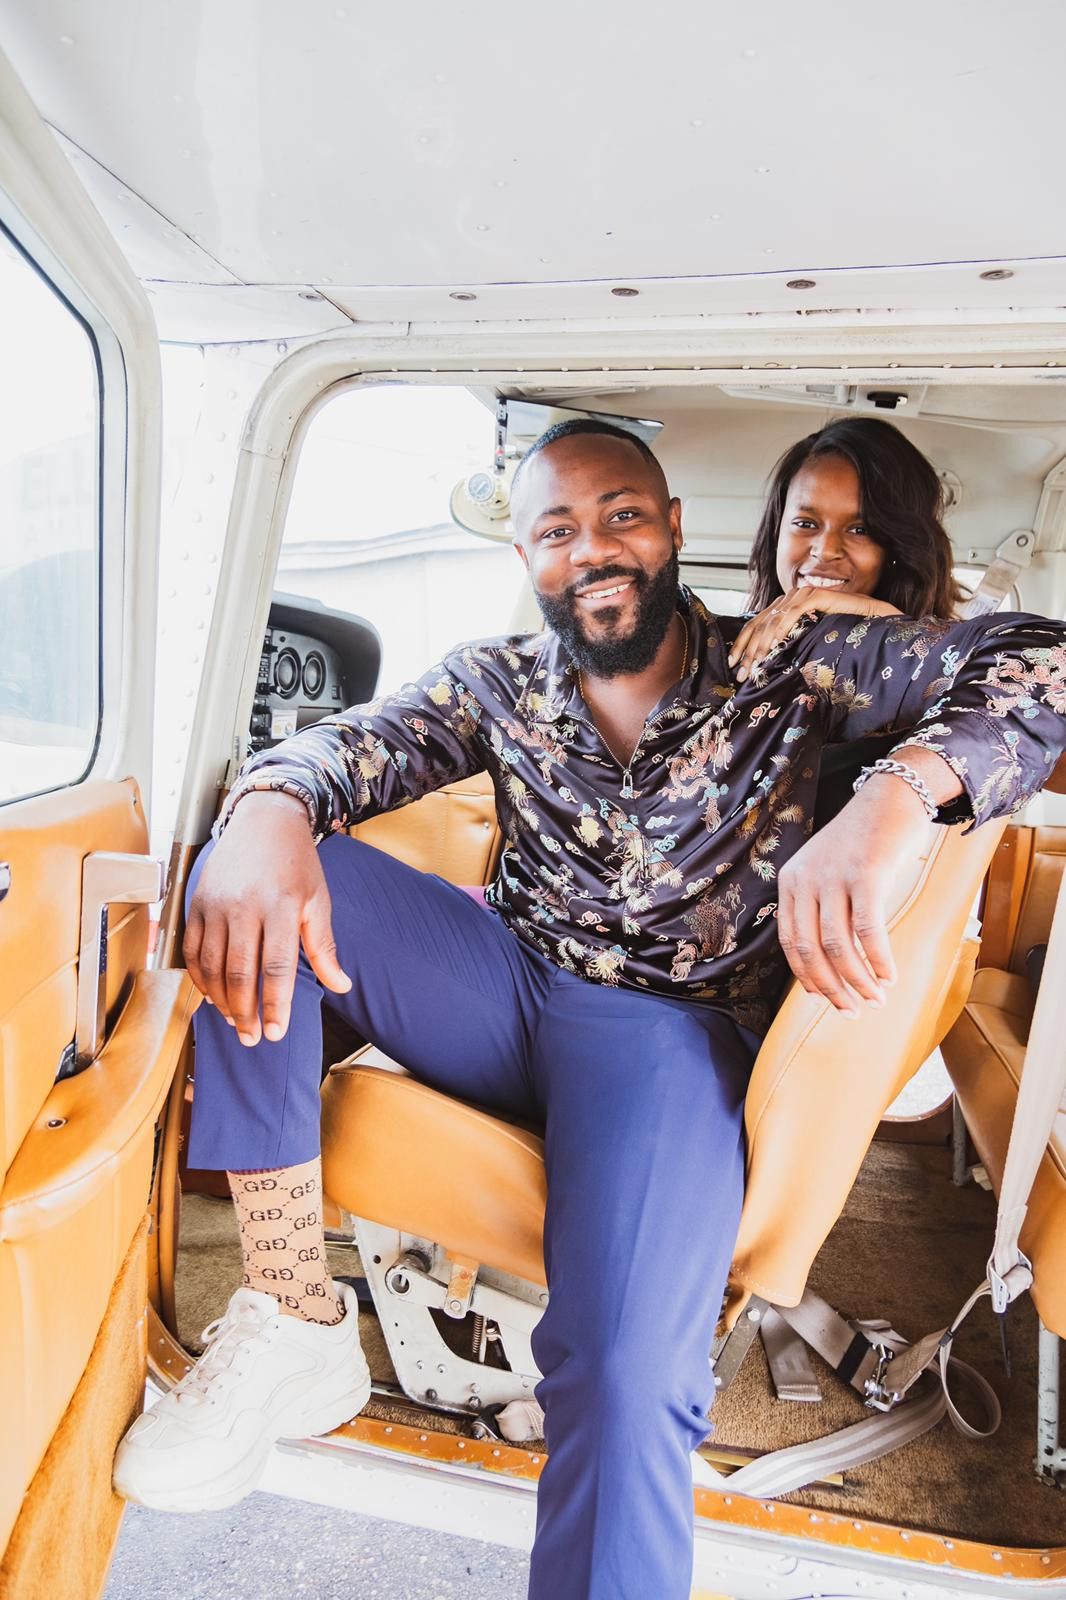 Nigerian Man Samuel Enyi aka DJ IREM becomes the first Black man to engage his fiance on a single engine airplane lindaikejisblog2